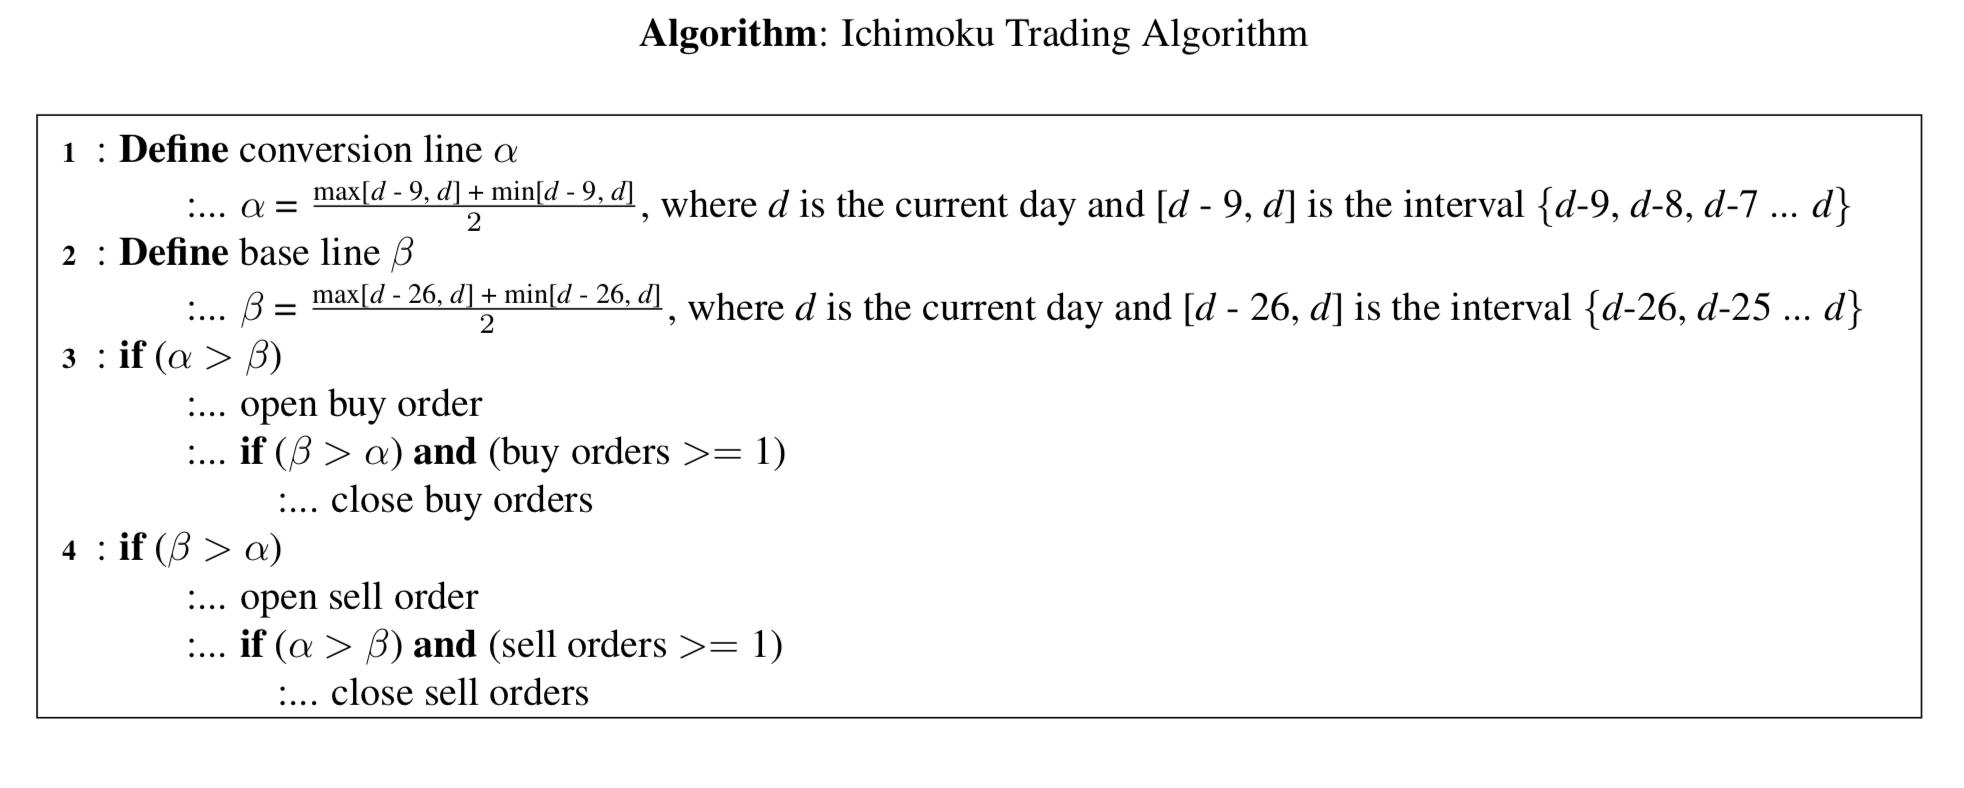 Algorithmic Trading - Ichimoku Trading Algorithm – Omar